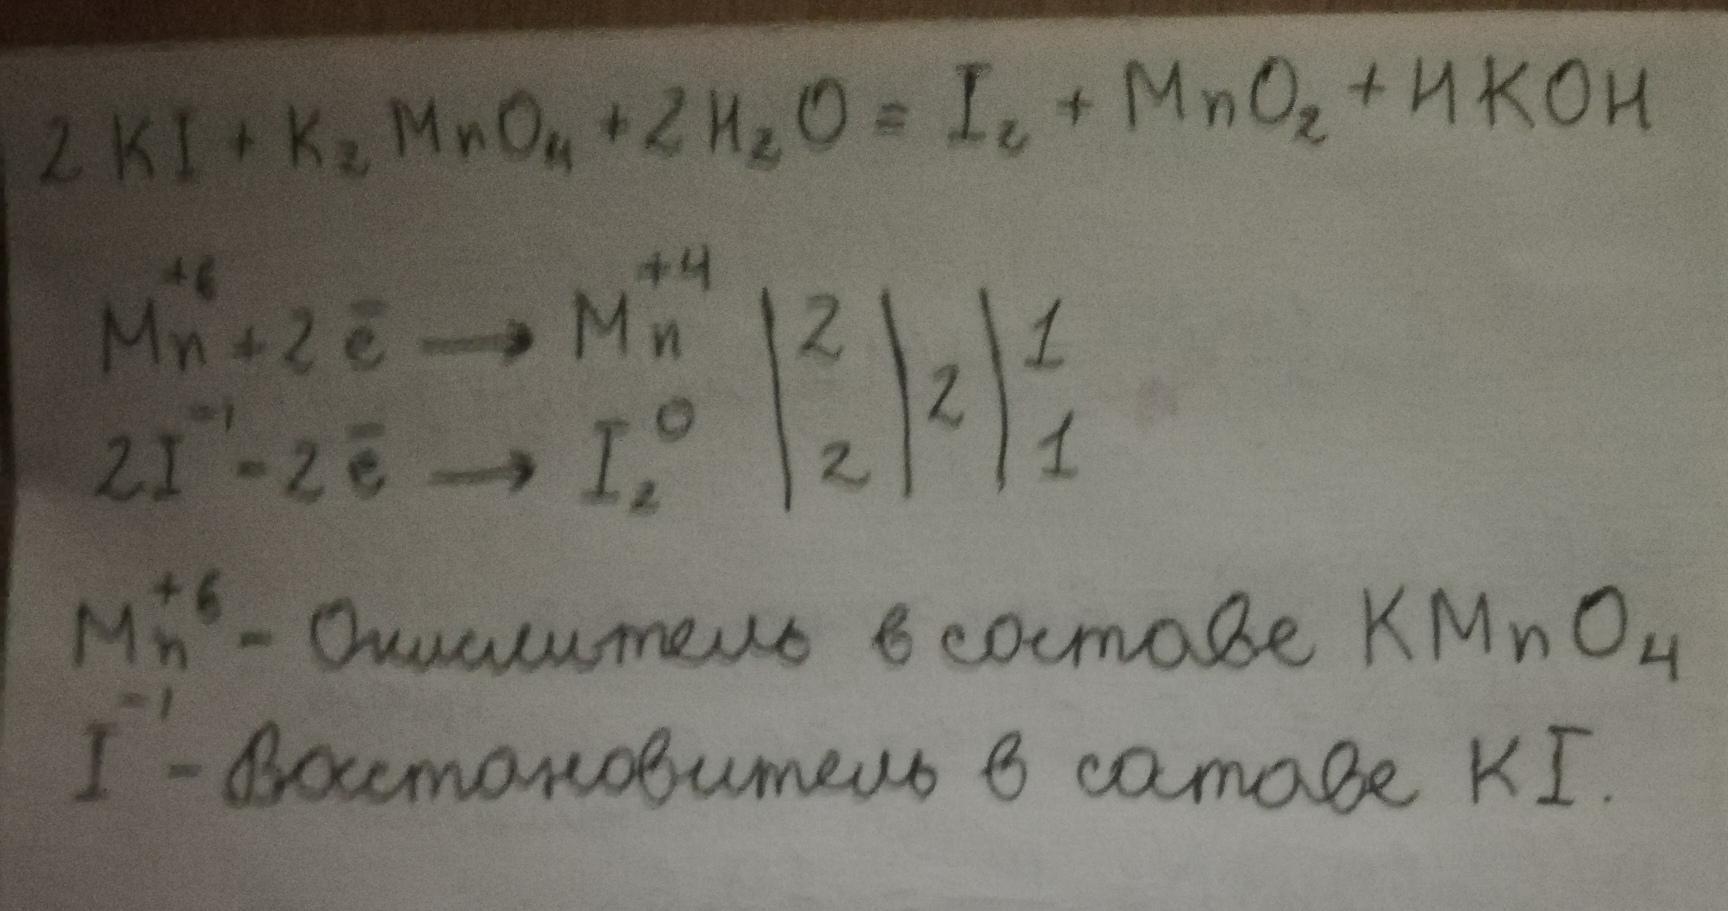 MnO2+I2+KOH-K2MnO4+KI+H2O